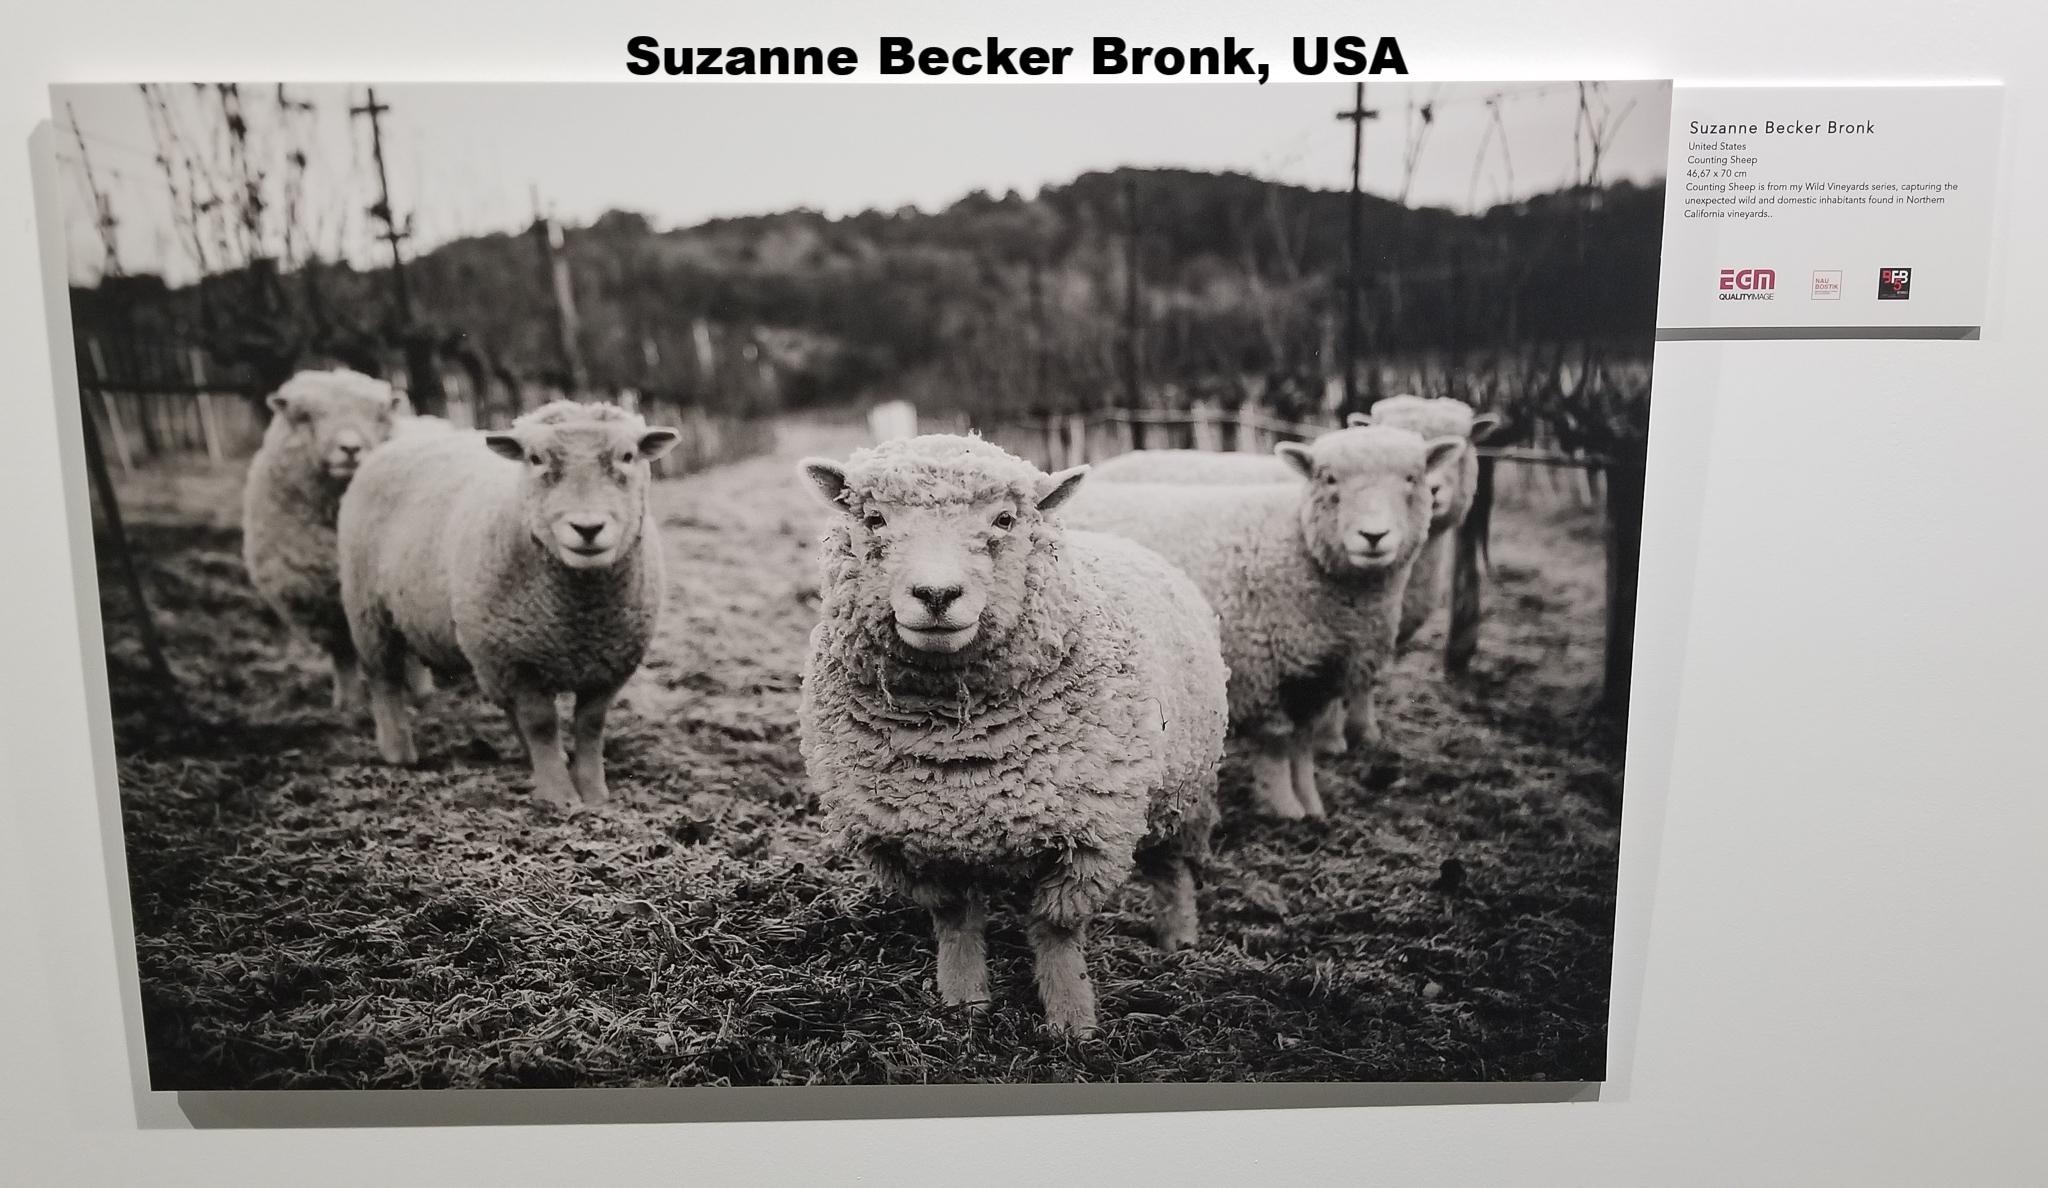 Suzanne Becker Bronk, United States